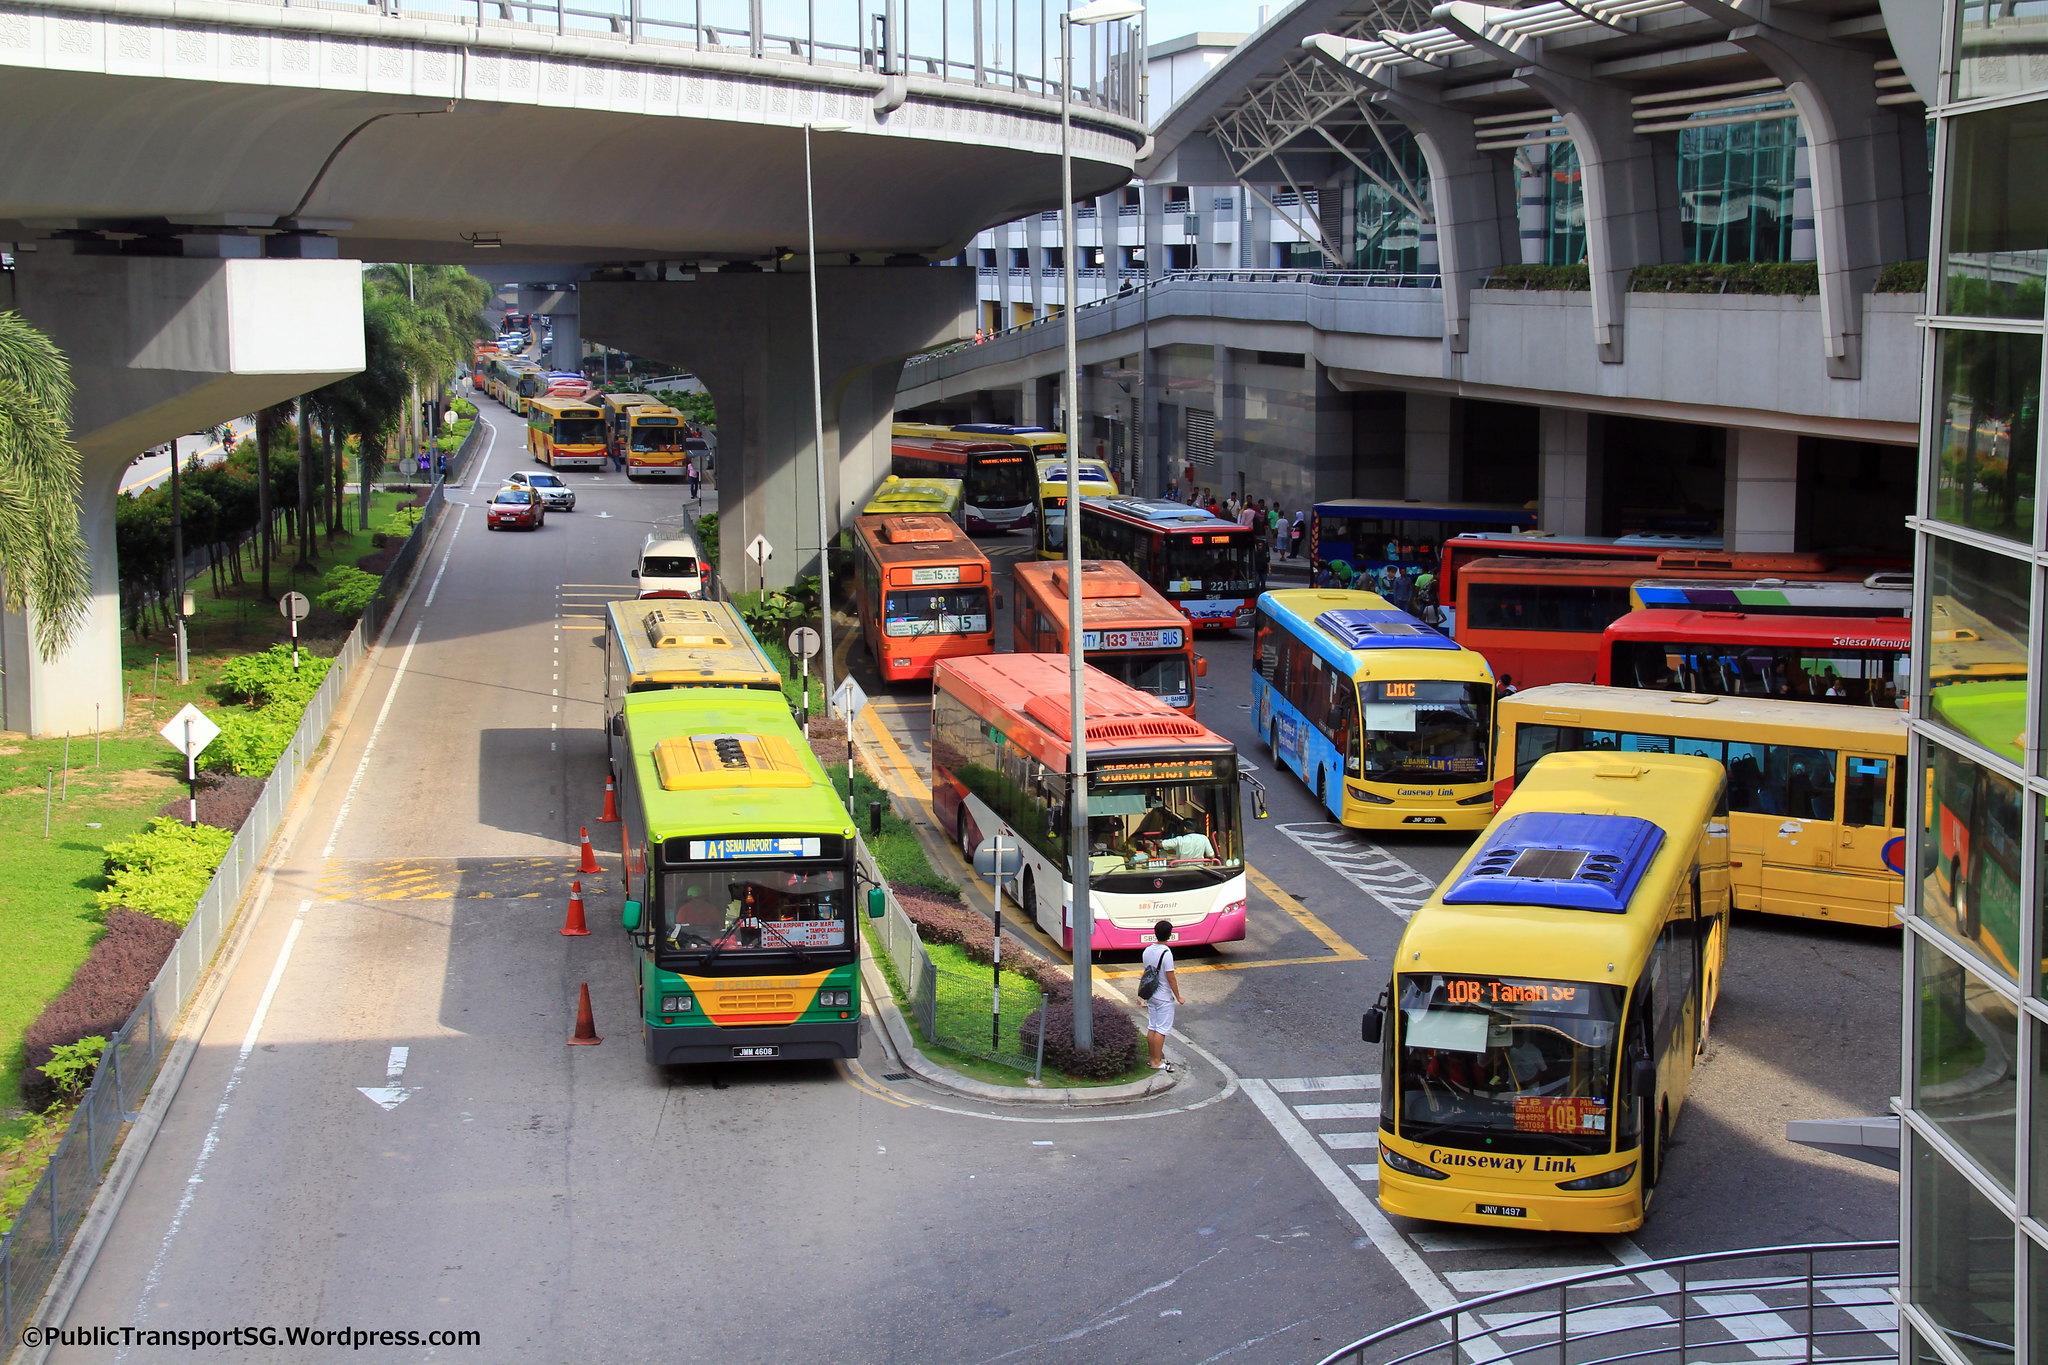 Jb Sentral Bus Terminal Land Transport Guru Perdana All Oprator Takeover Of Jln Wong Ah Fook Services